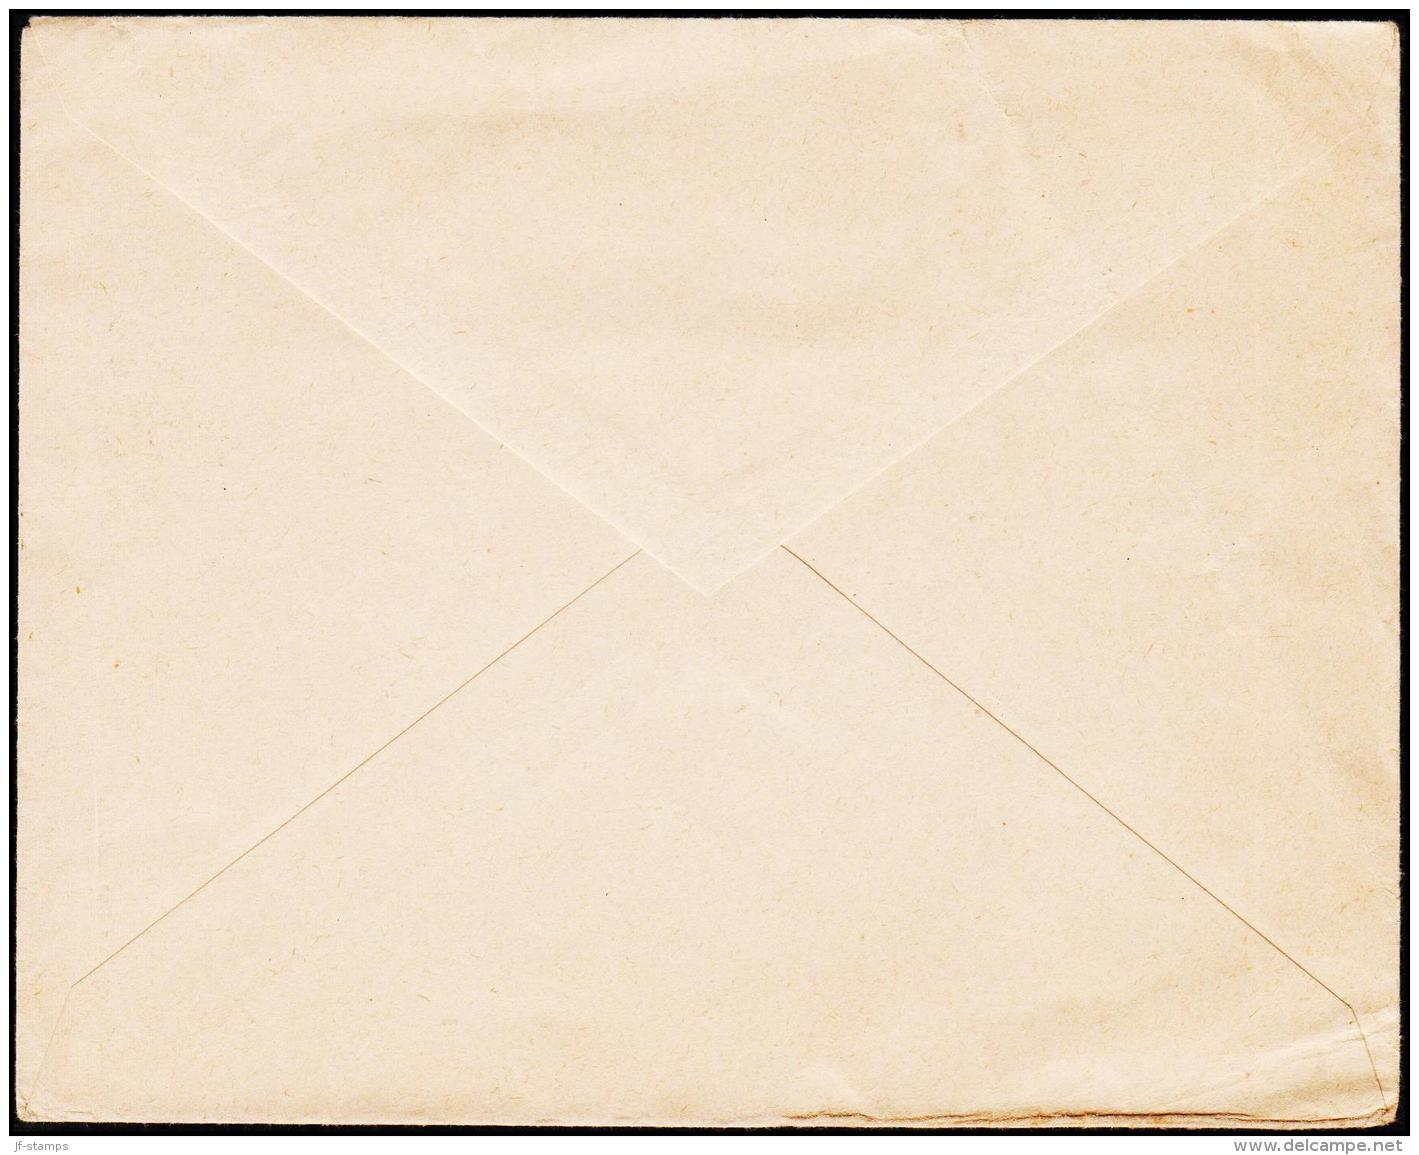 1901. 5 øre NAKSKOV 30.1.01. Reklame WIBOLTTS DANISH BALL HEAD CABBAGE. To USA.  (Michel: ) - JF194842 - Briefe U. Dokumente